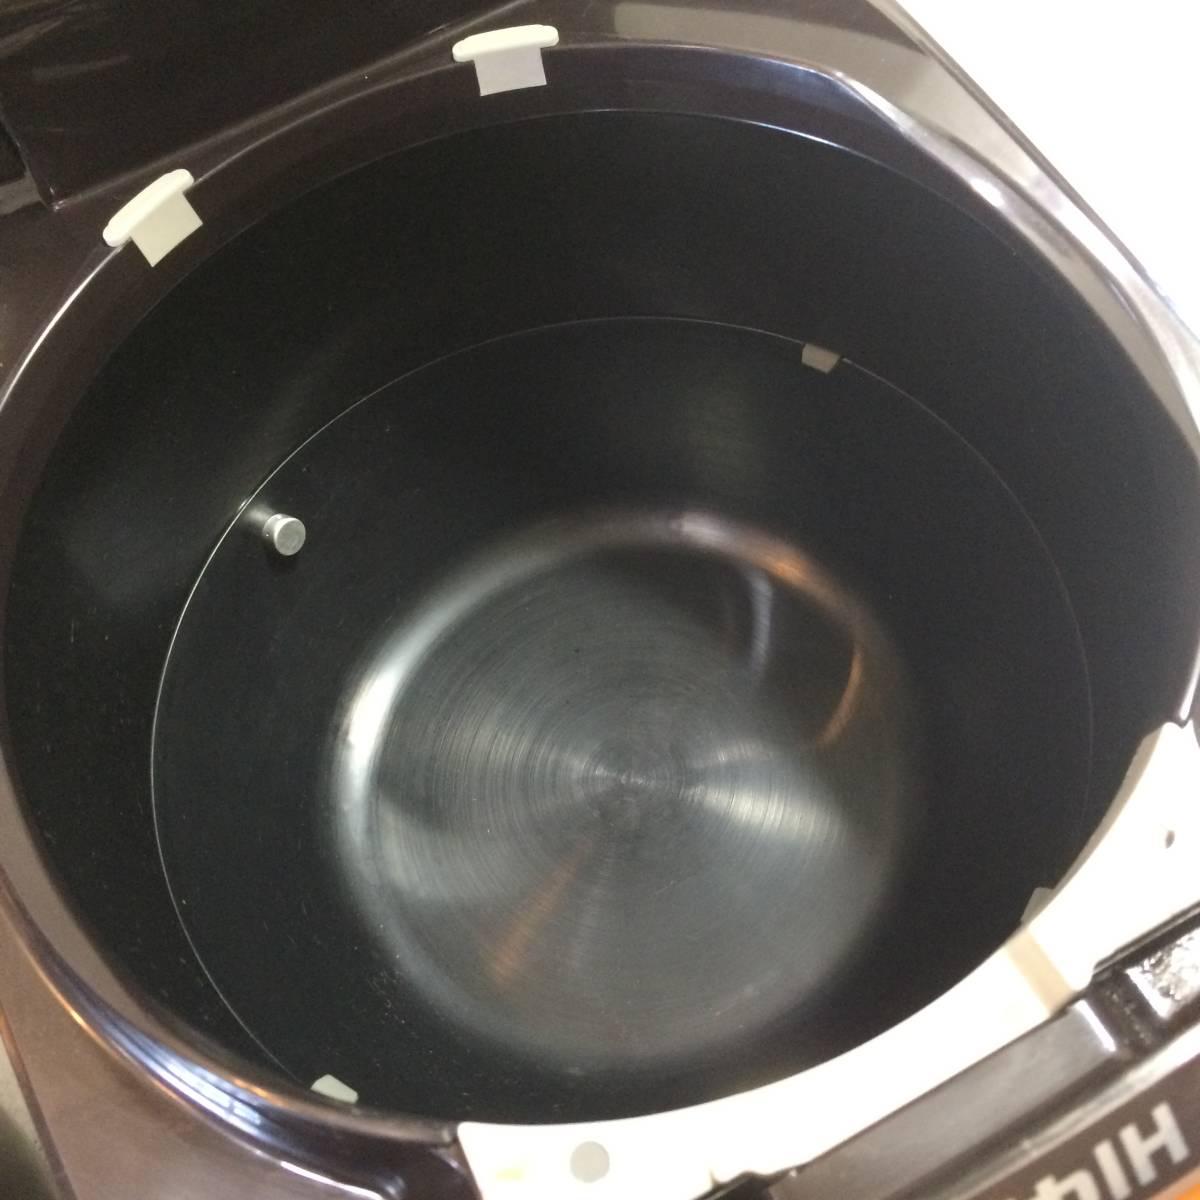 ZOJIRUSHI 象印 NP-ZF18-TD IHジャー 炊飯器 1升 1.8L 2017年製 【中古品】_画像5